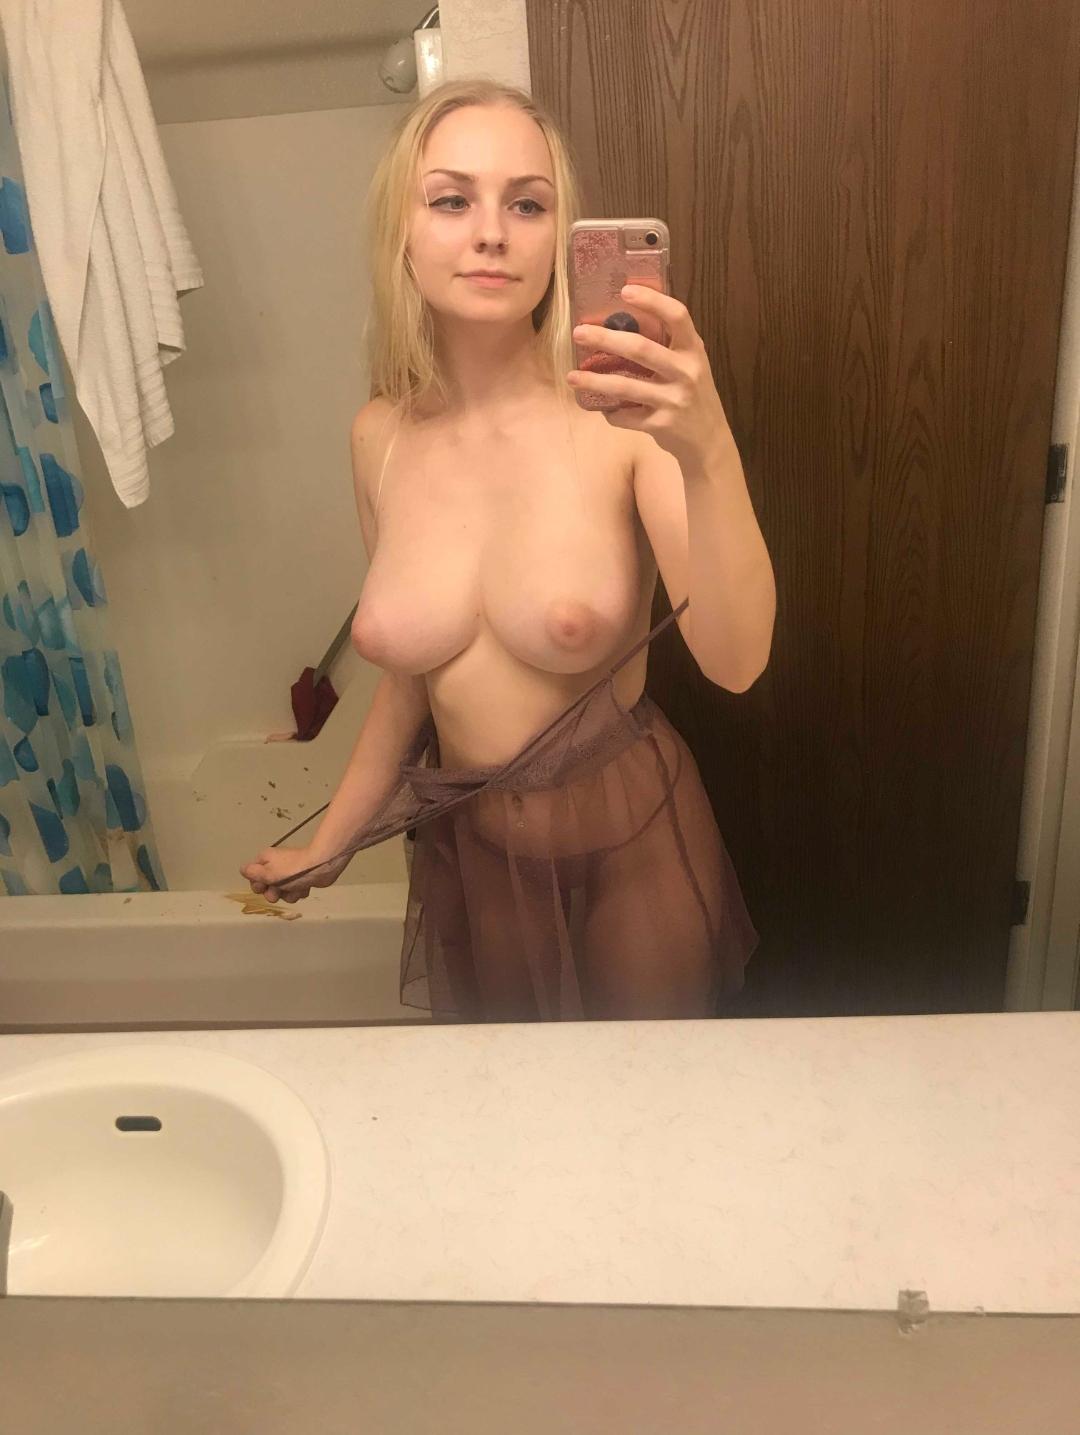 Slfies nude Tamra Judge,